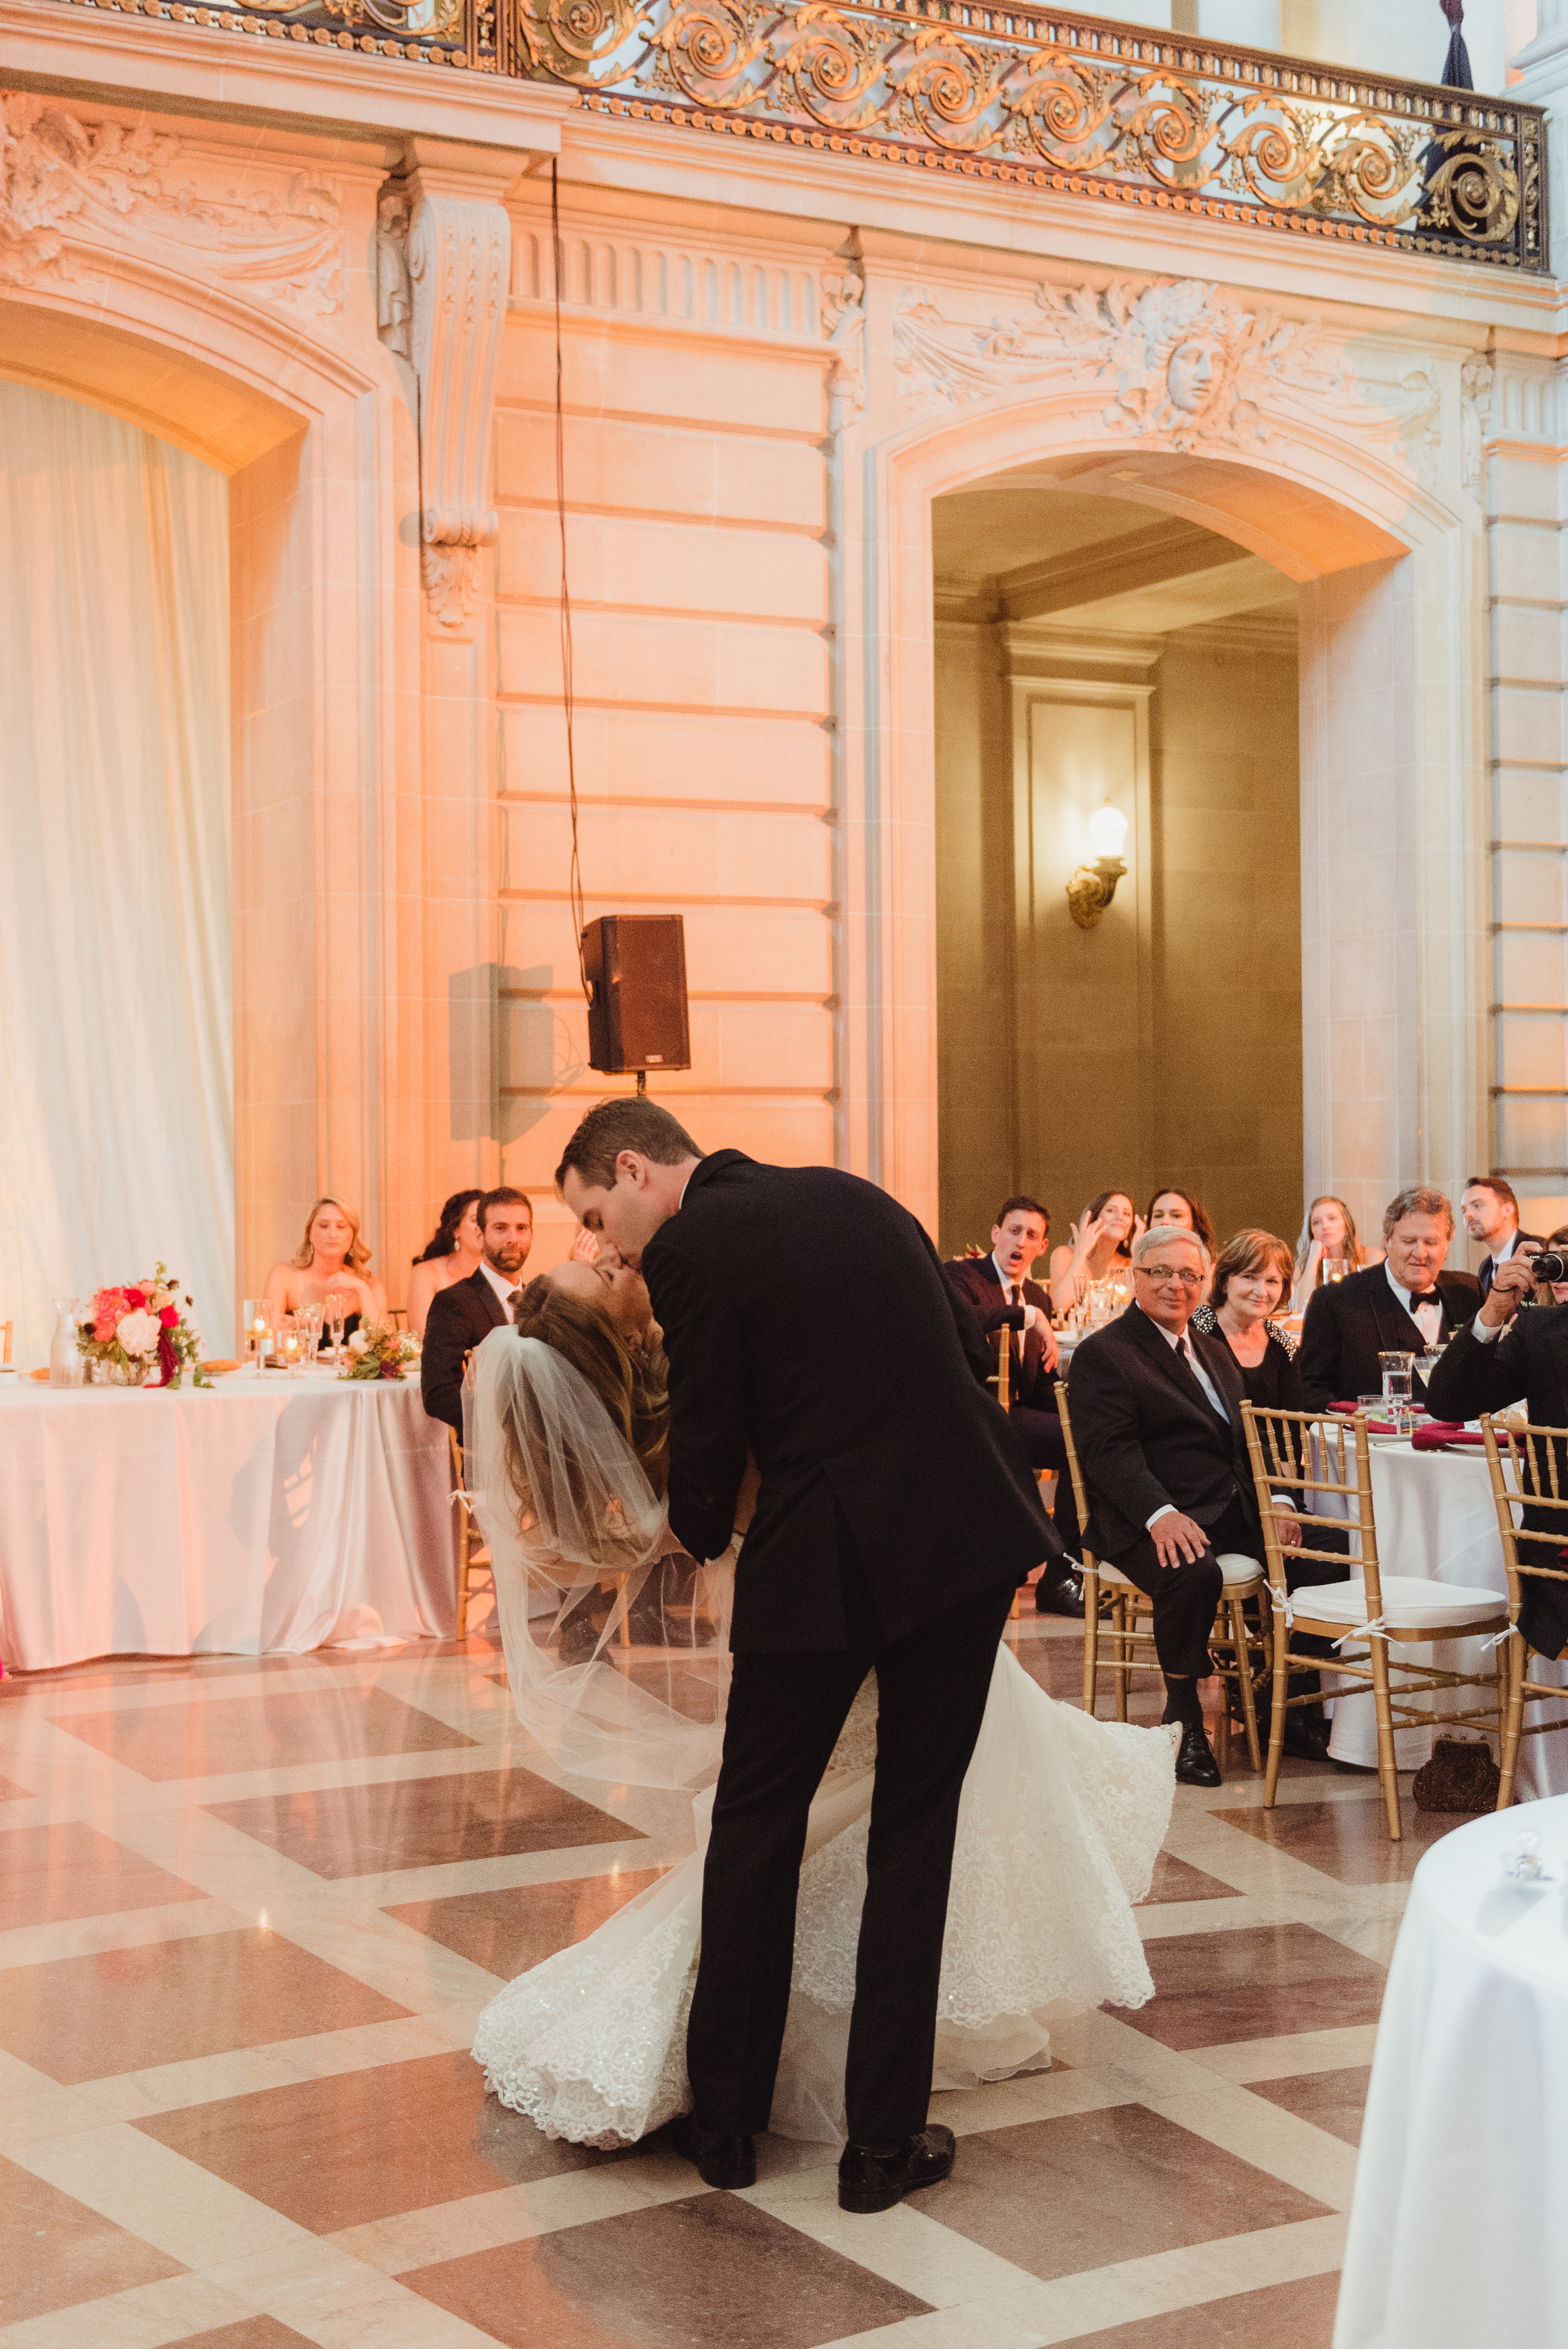 78-elegant-san-francisco-city-hall-wedding-vivianchen-0866.jpg